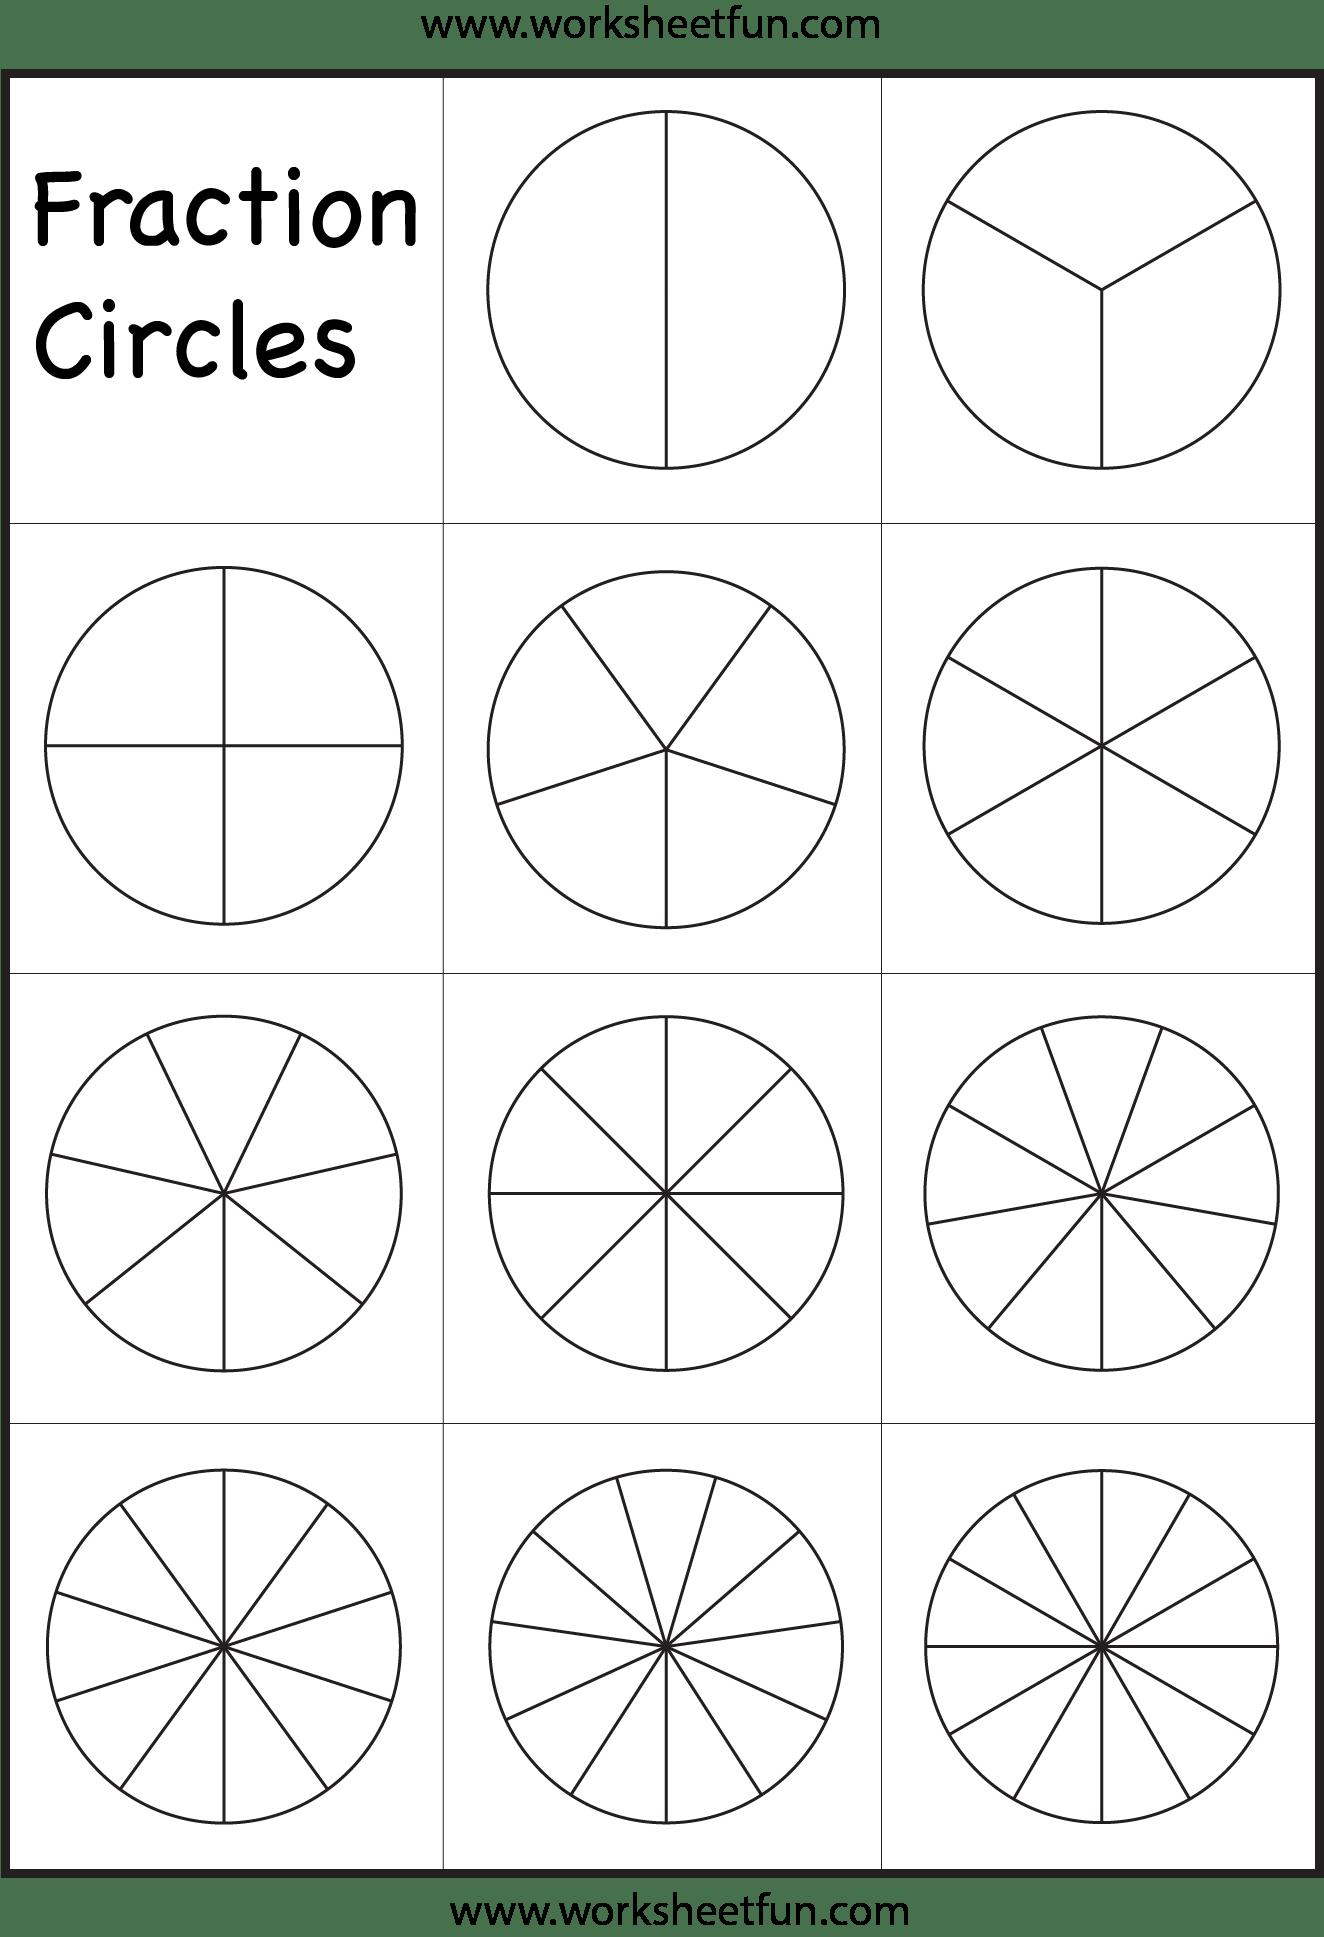 hight resolution of Fraction Circles Template – Printable Fraction Circles – 1 Worksheet / FREE  Printable Worksheets – Worksheetfun